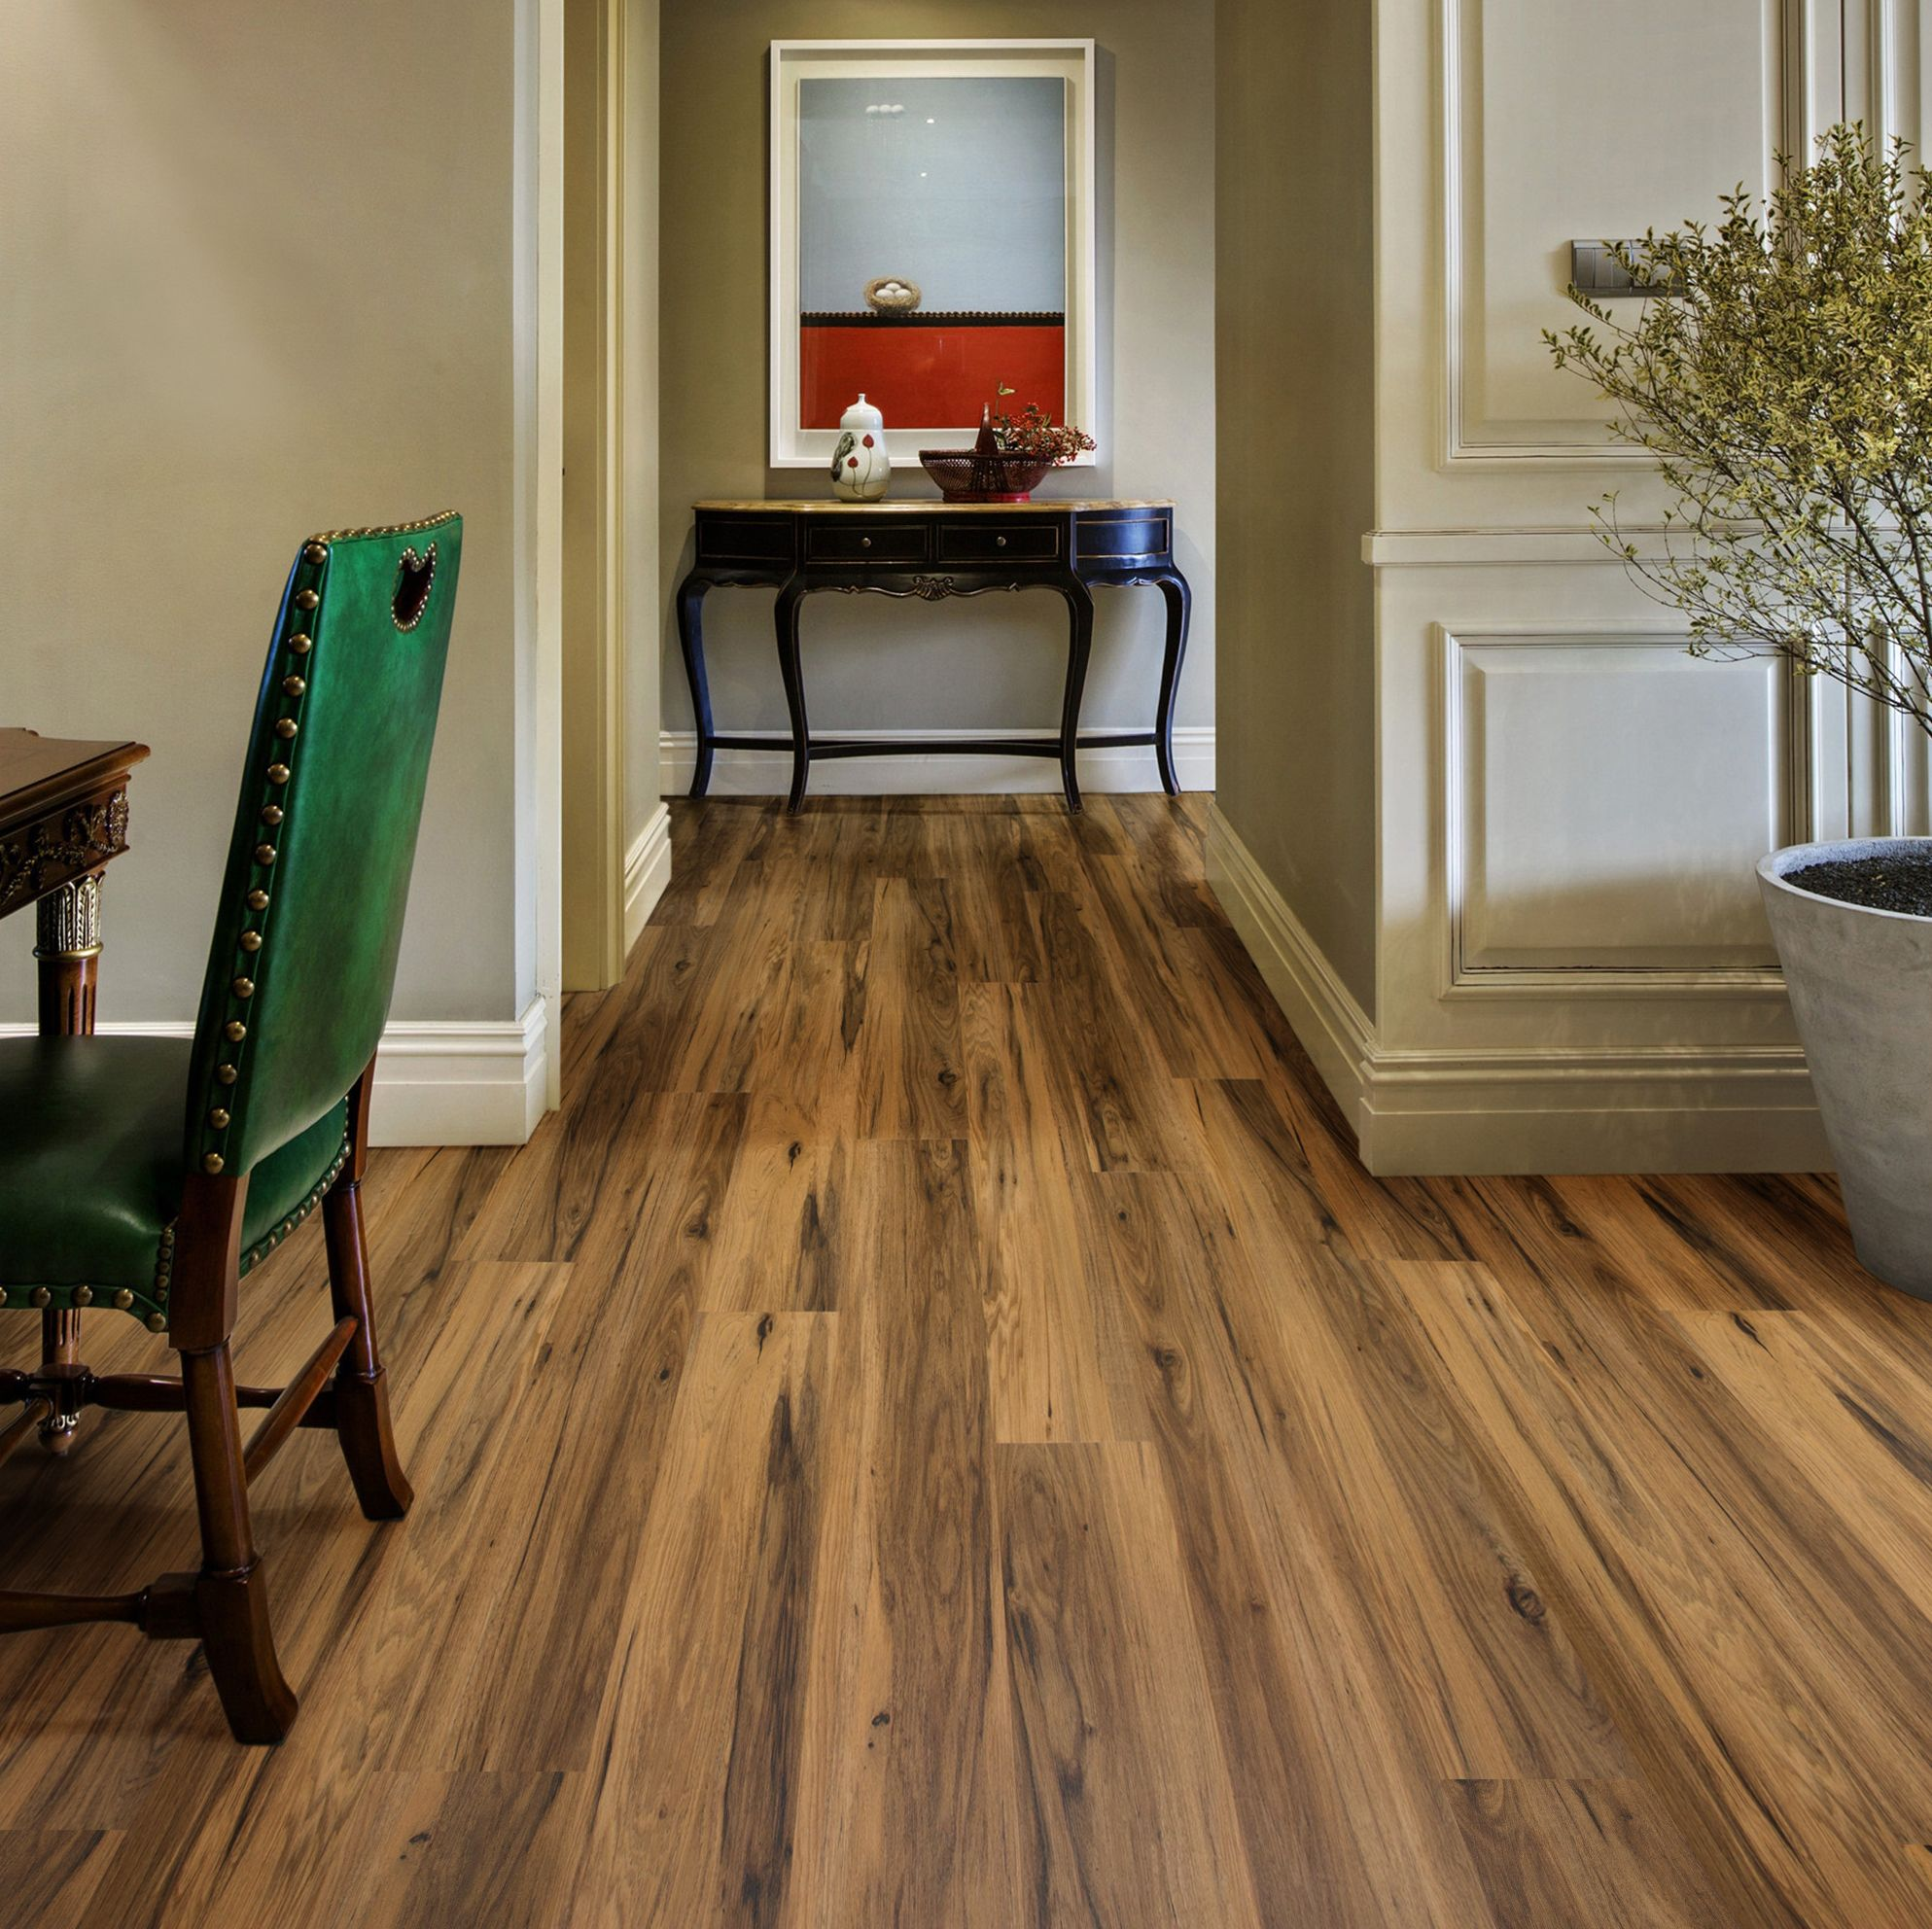 Firmfit Topaz Windsor Best vinyl flooring, Vinyl